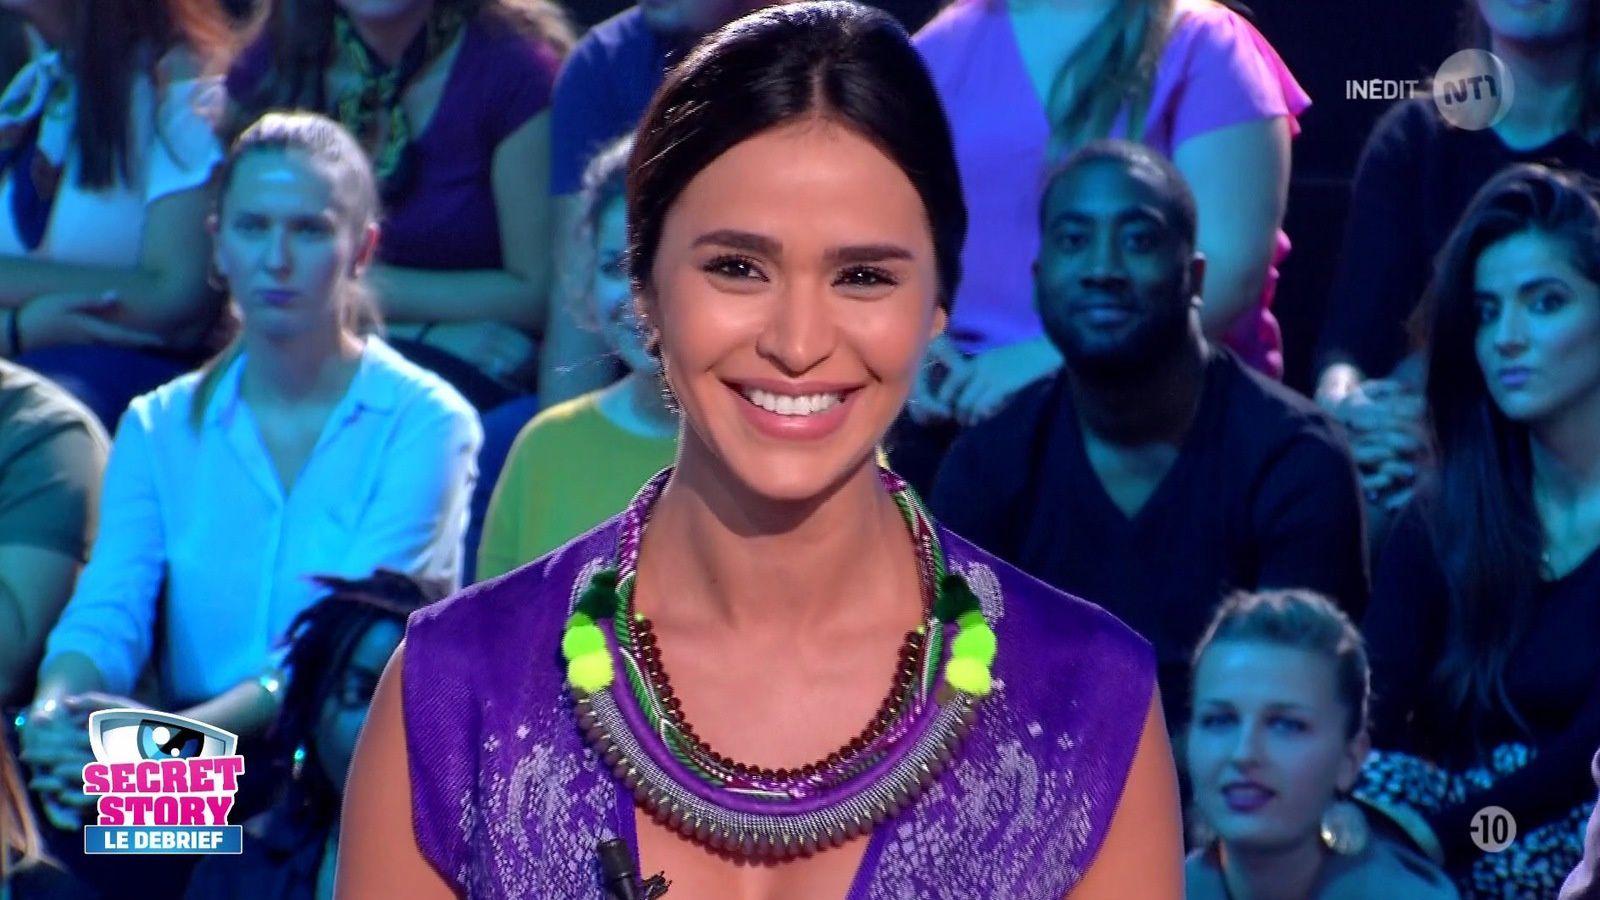 LEILA BEN KHALIFA ❤️❤️❤️❤️❤️ @LeilaBenKhalifa ce soir @nt1 @SecretStory_TF1 #SS10 #vuesalatele